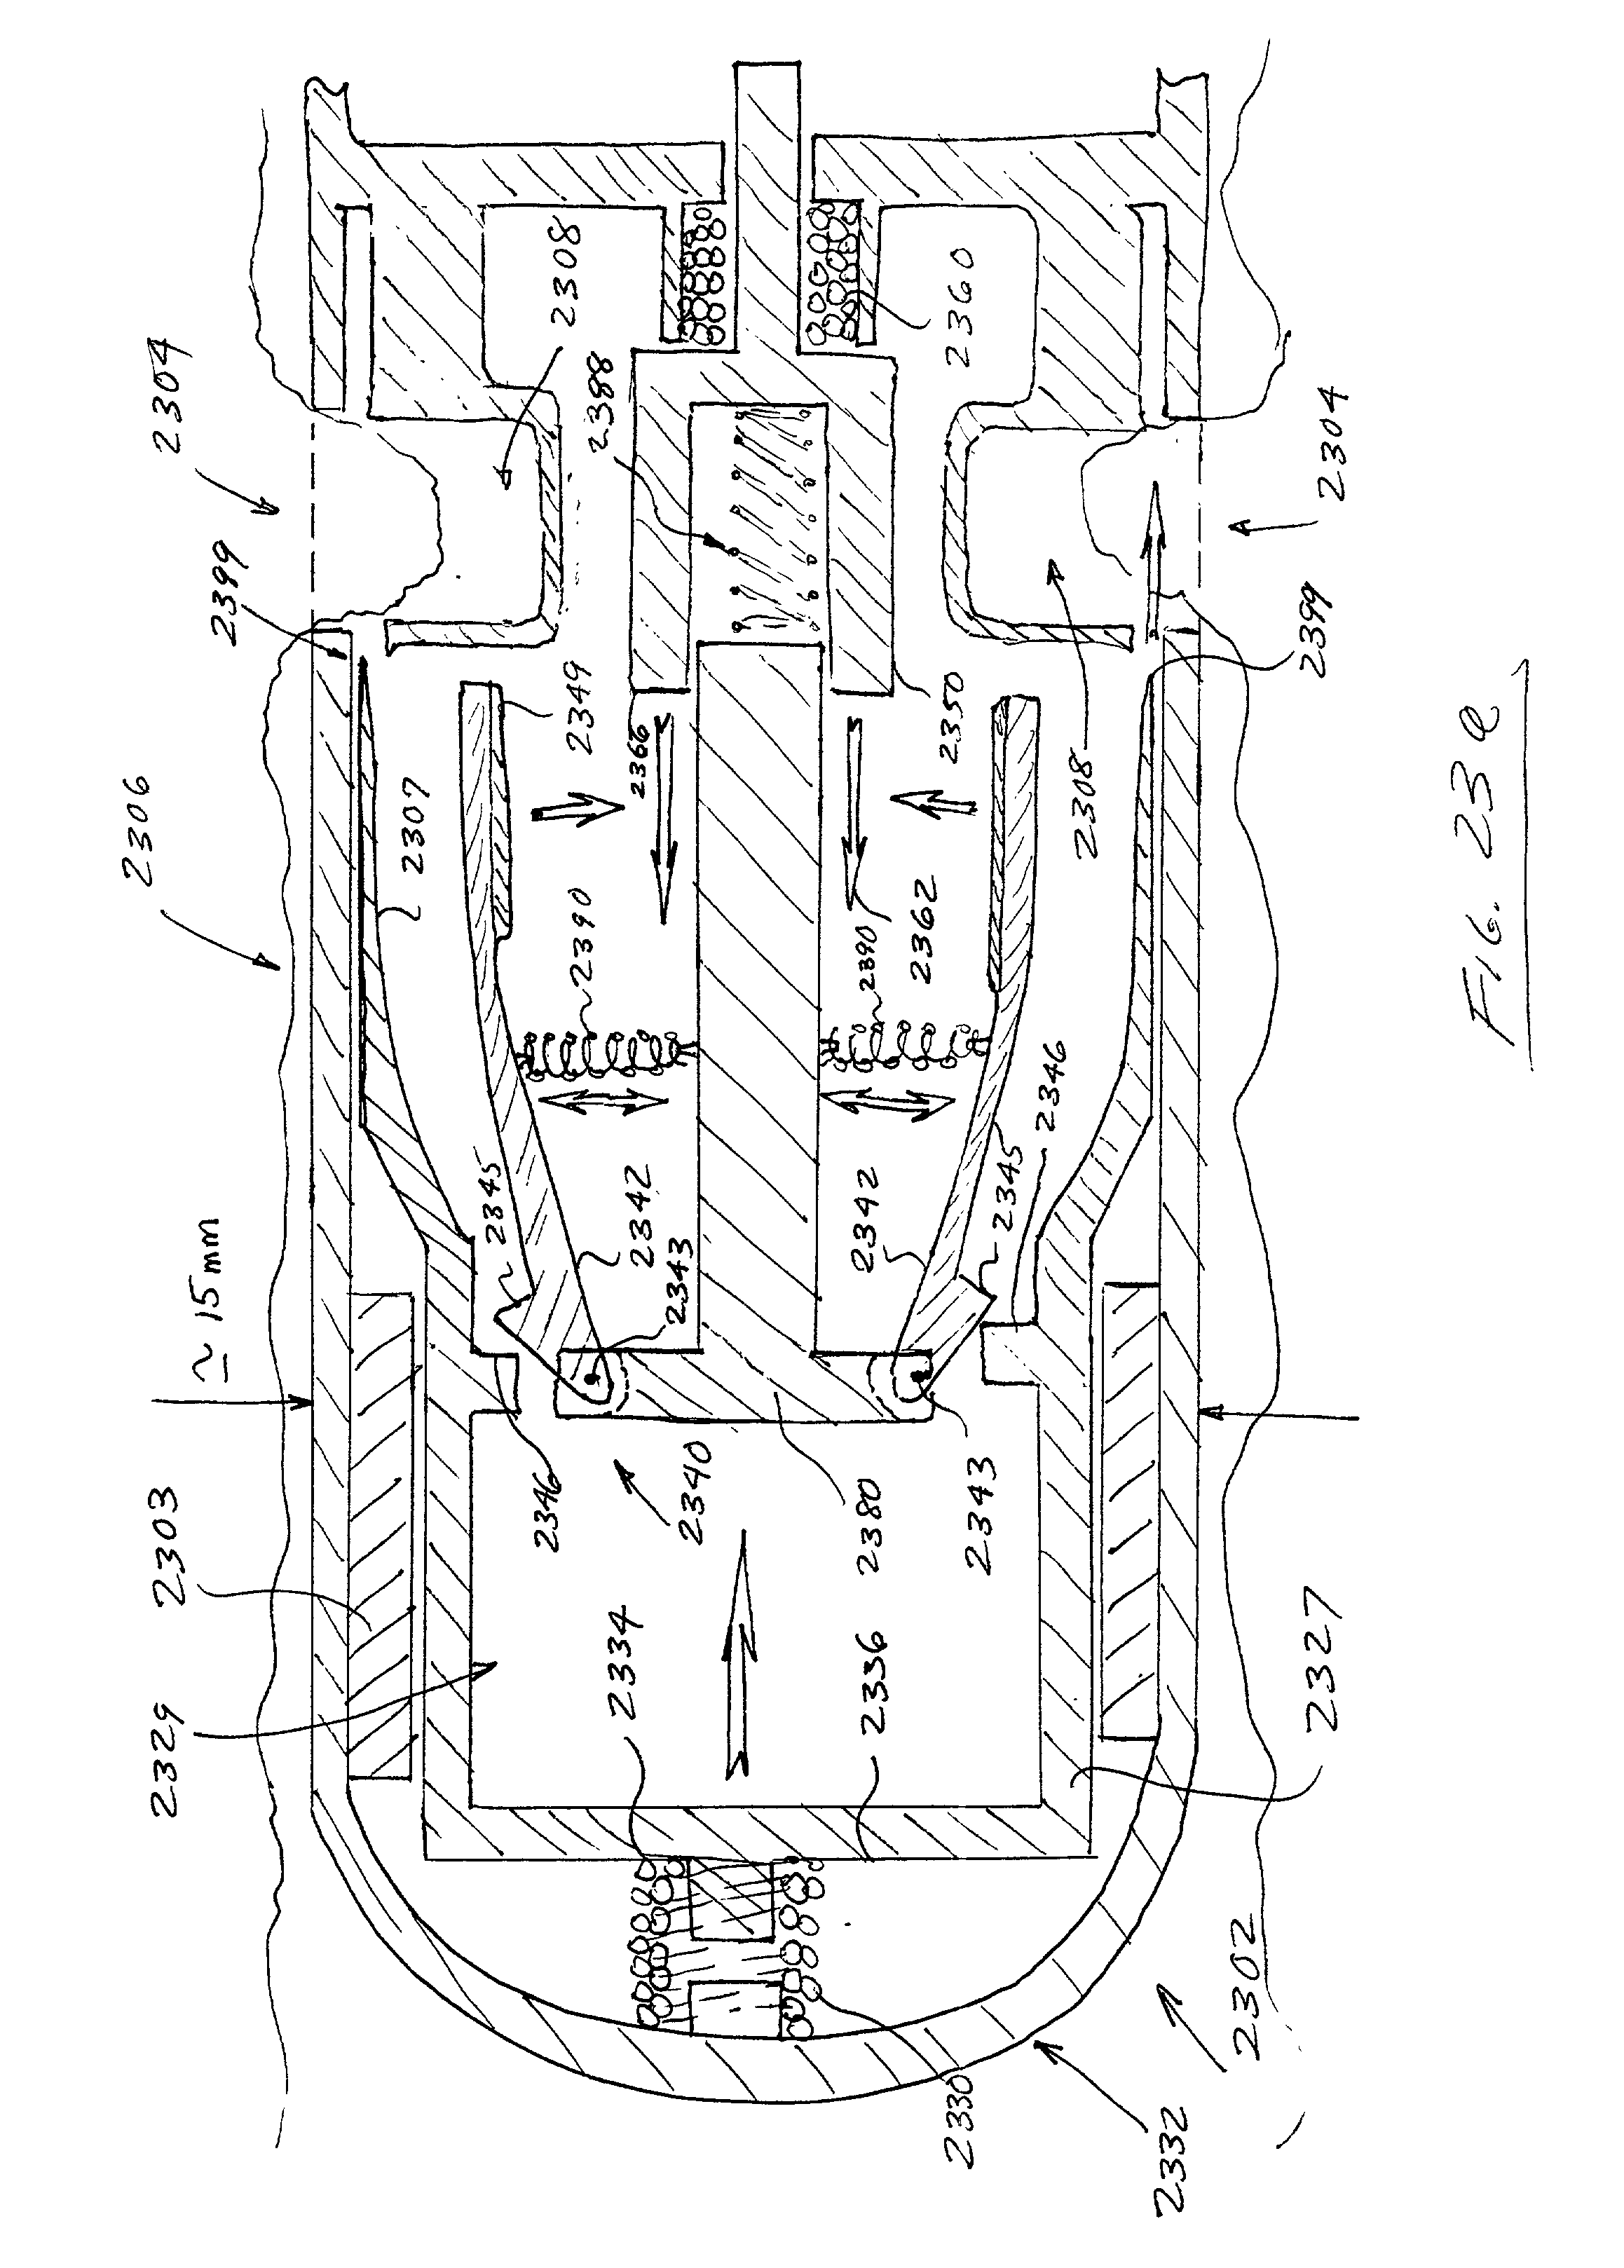 honda cm200t wiring diagram wiring libraryhonda cm200t motorcycle wiring  diagrams honda motorcycle fuel system wiring diagram